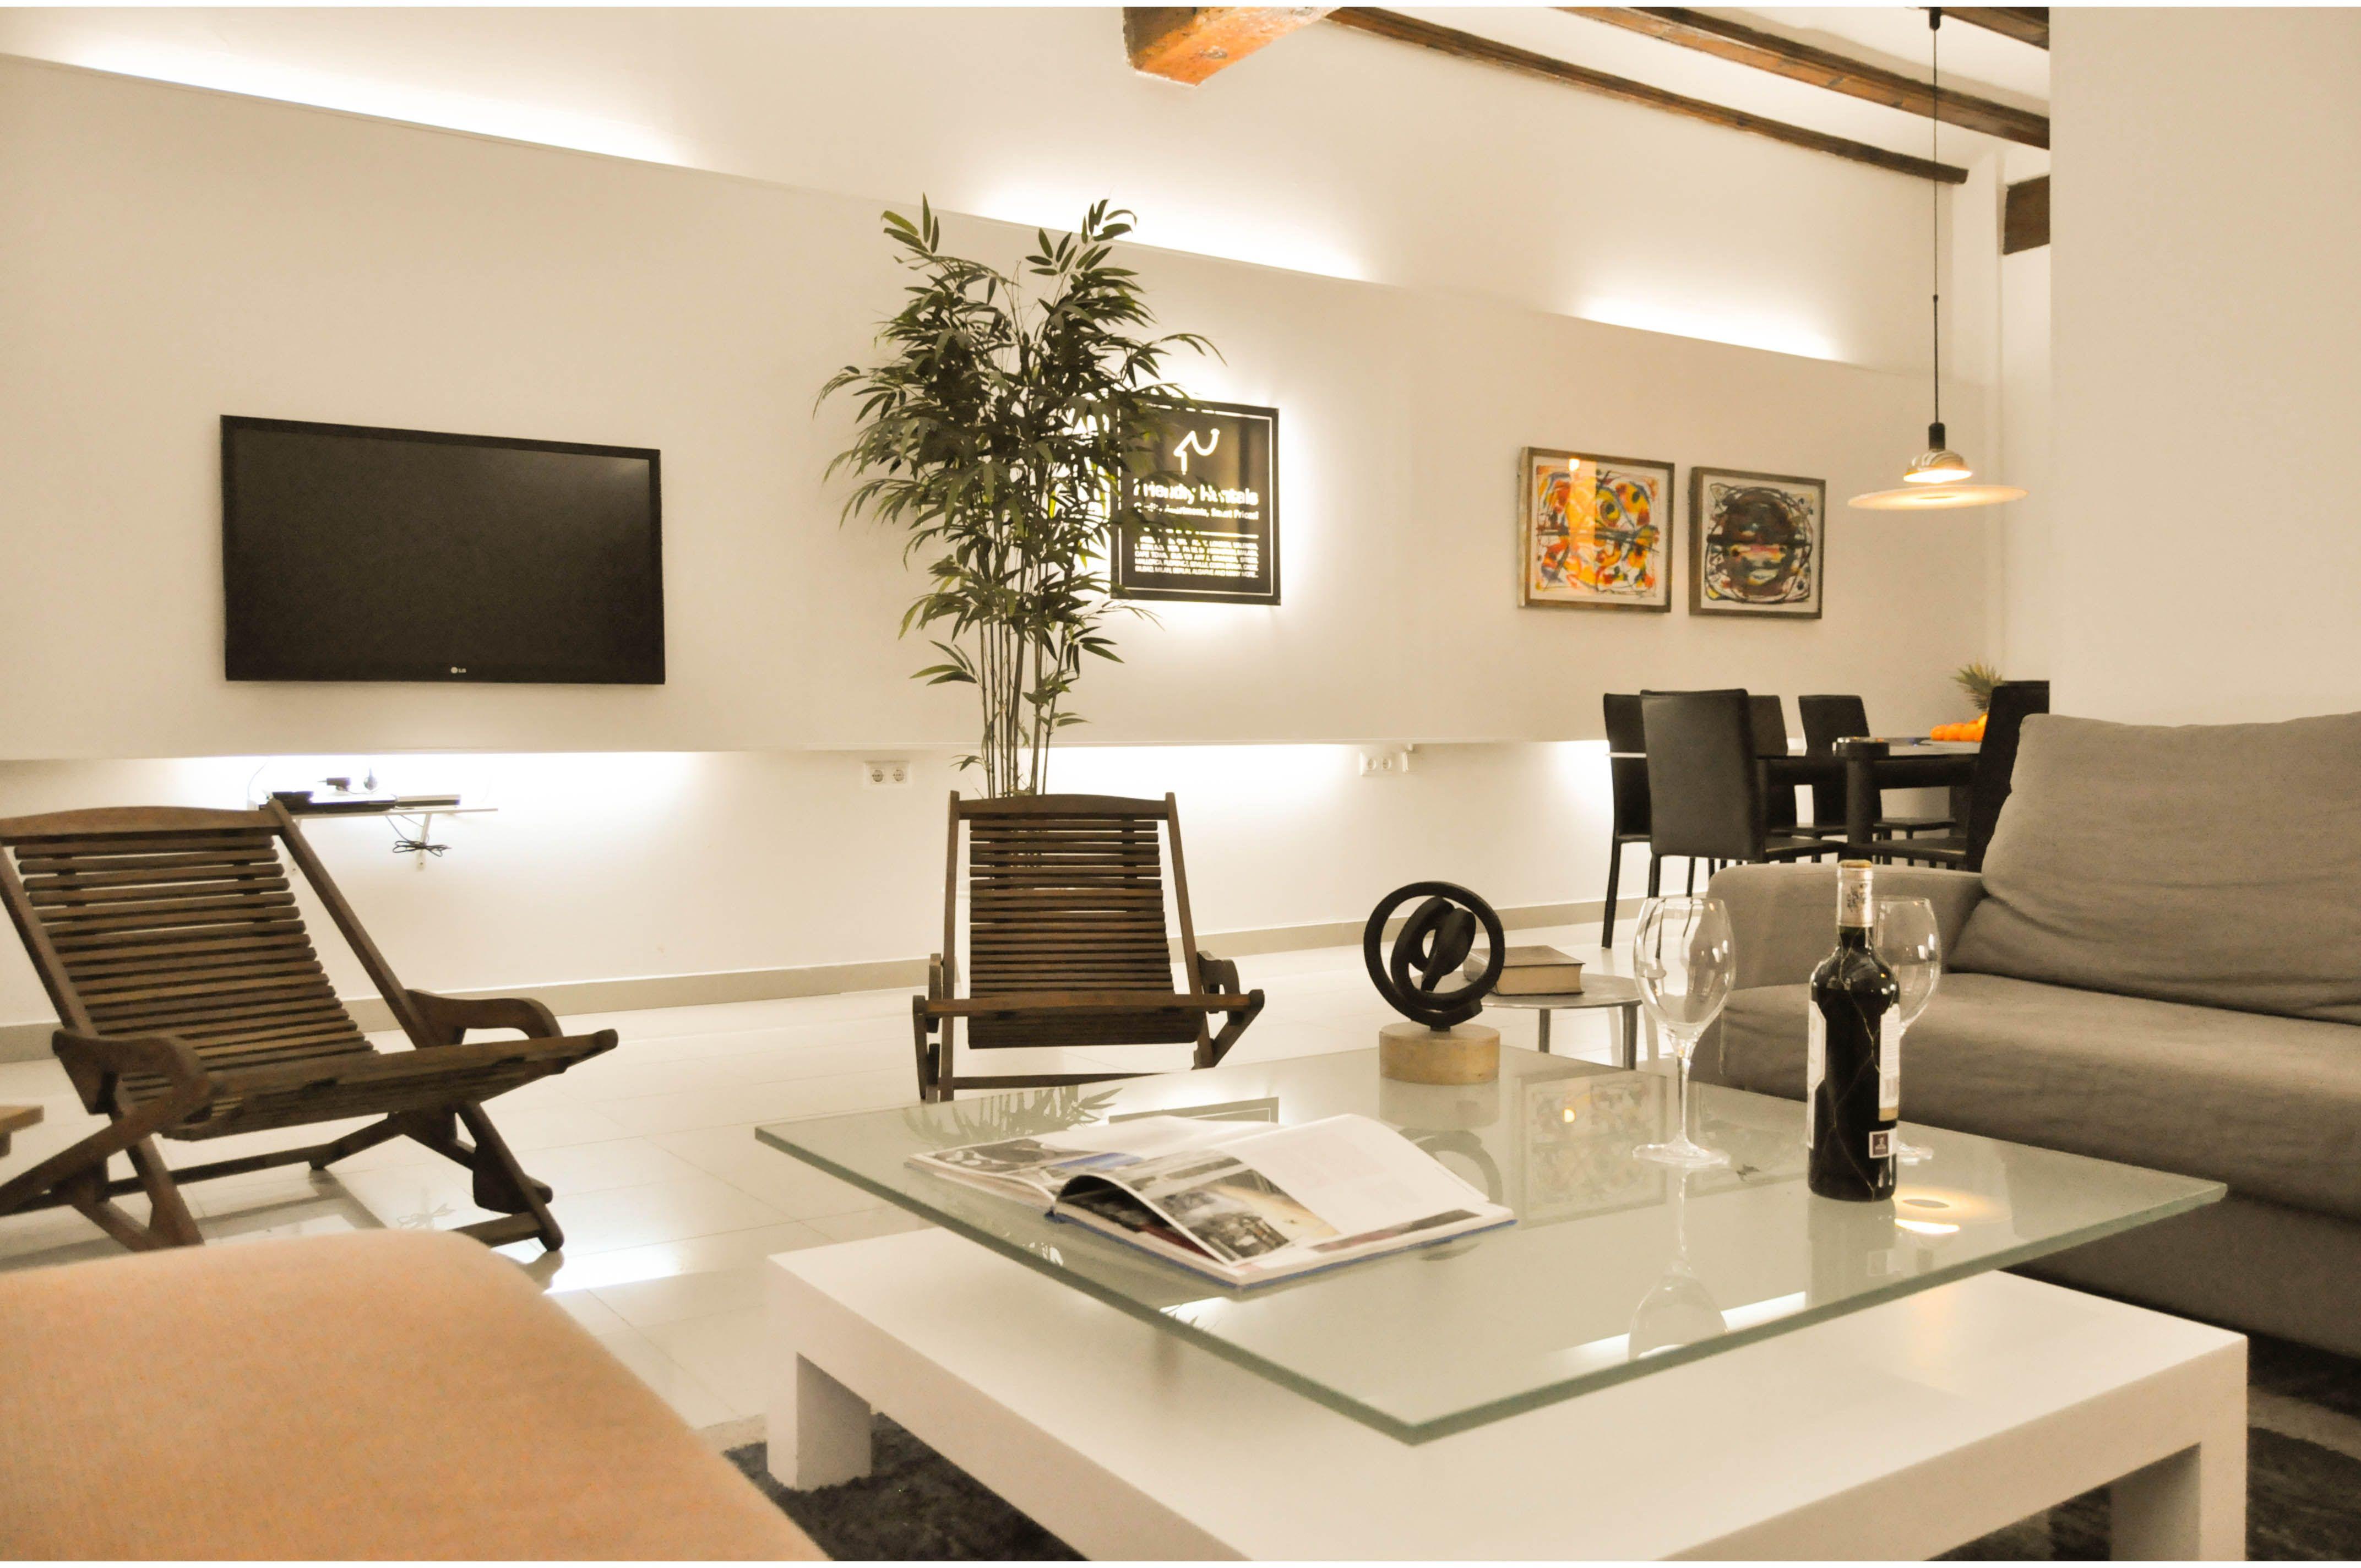 Getme Ayuntamiento 21A. Modern apartment located in ...